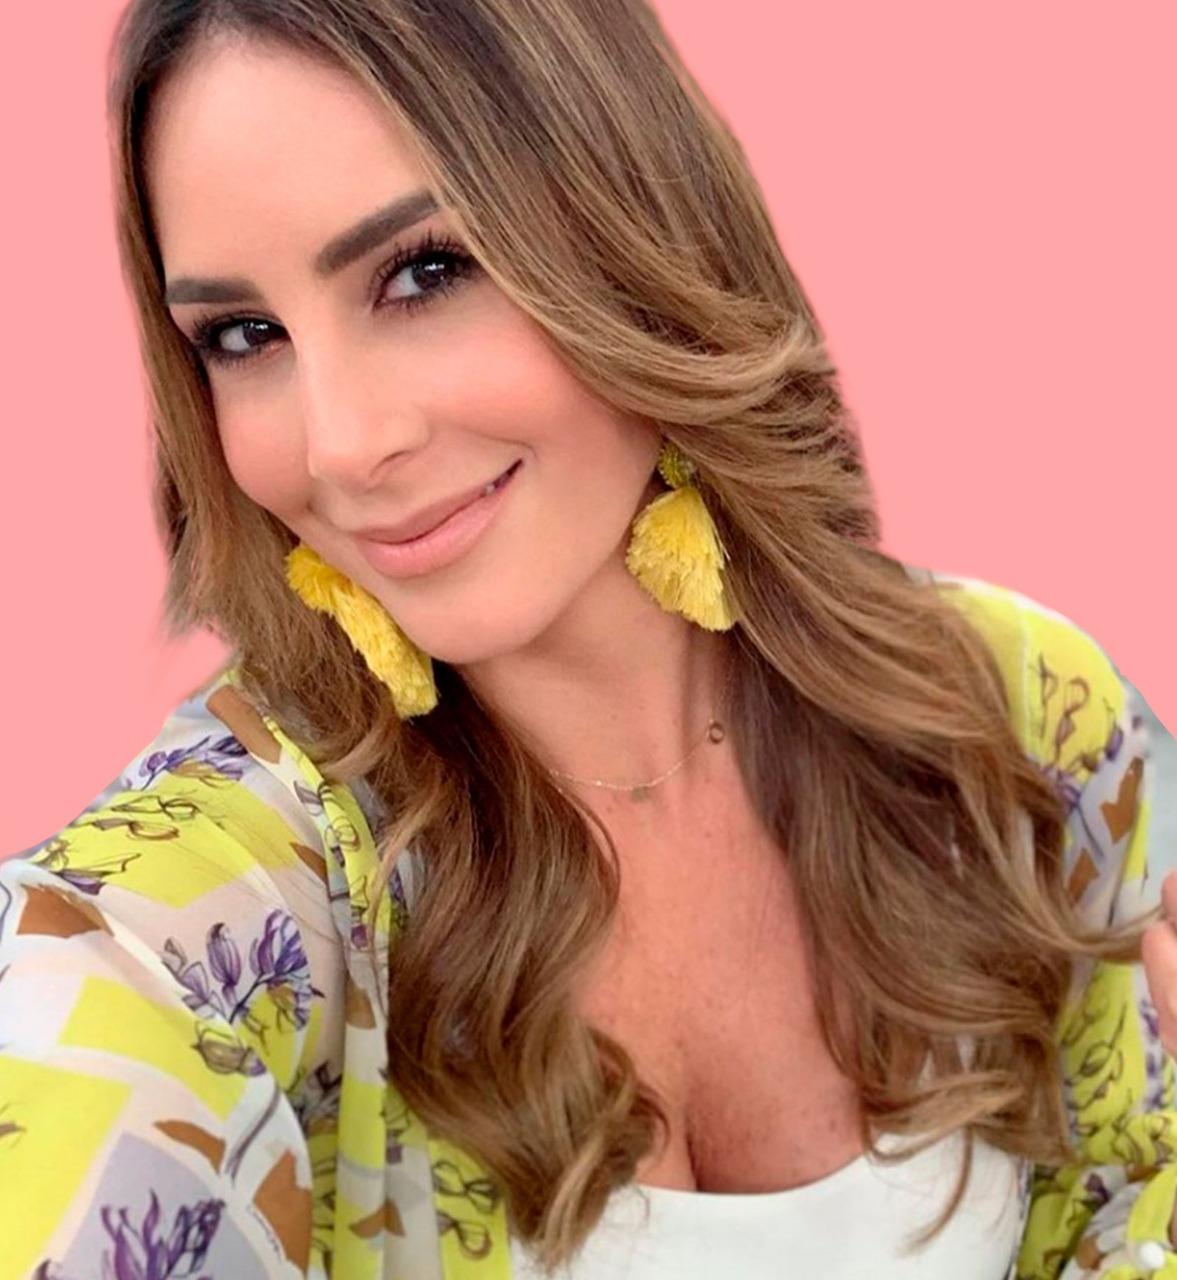 Carolina Soto se cambió sus implantes de senos